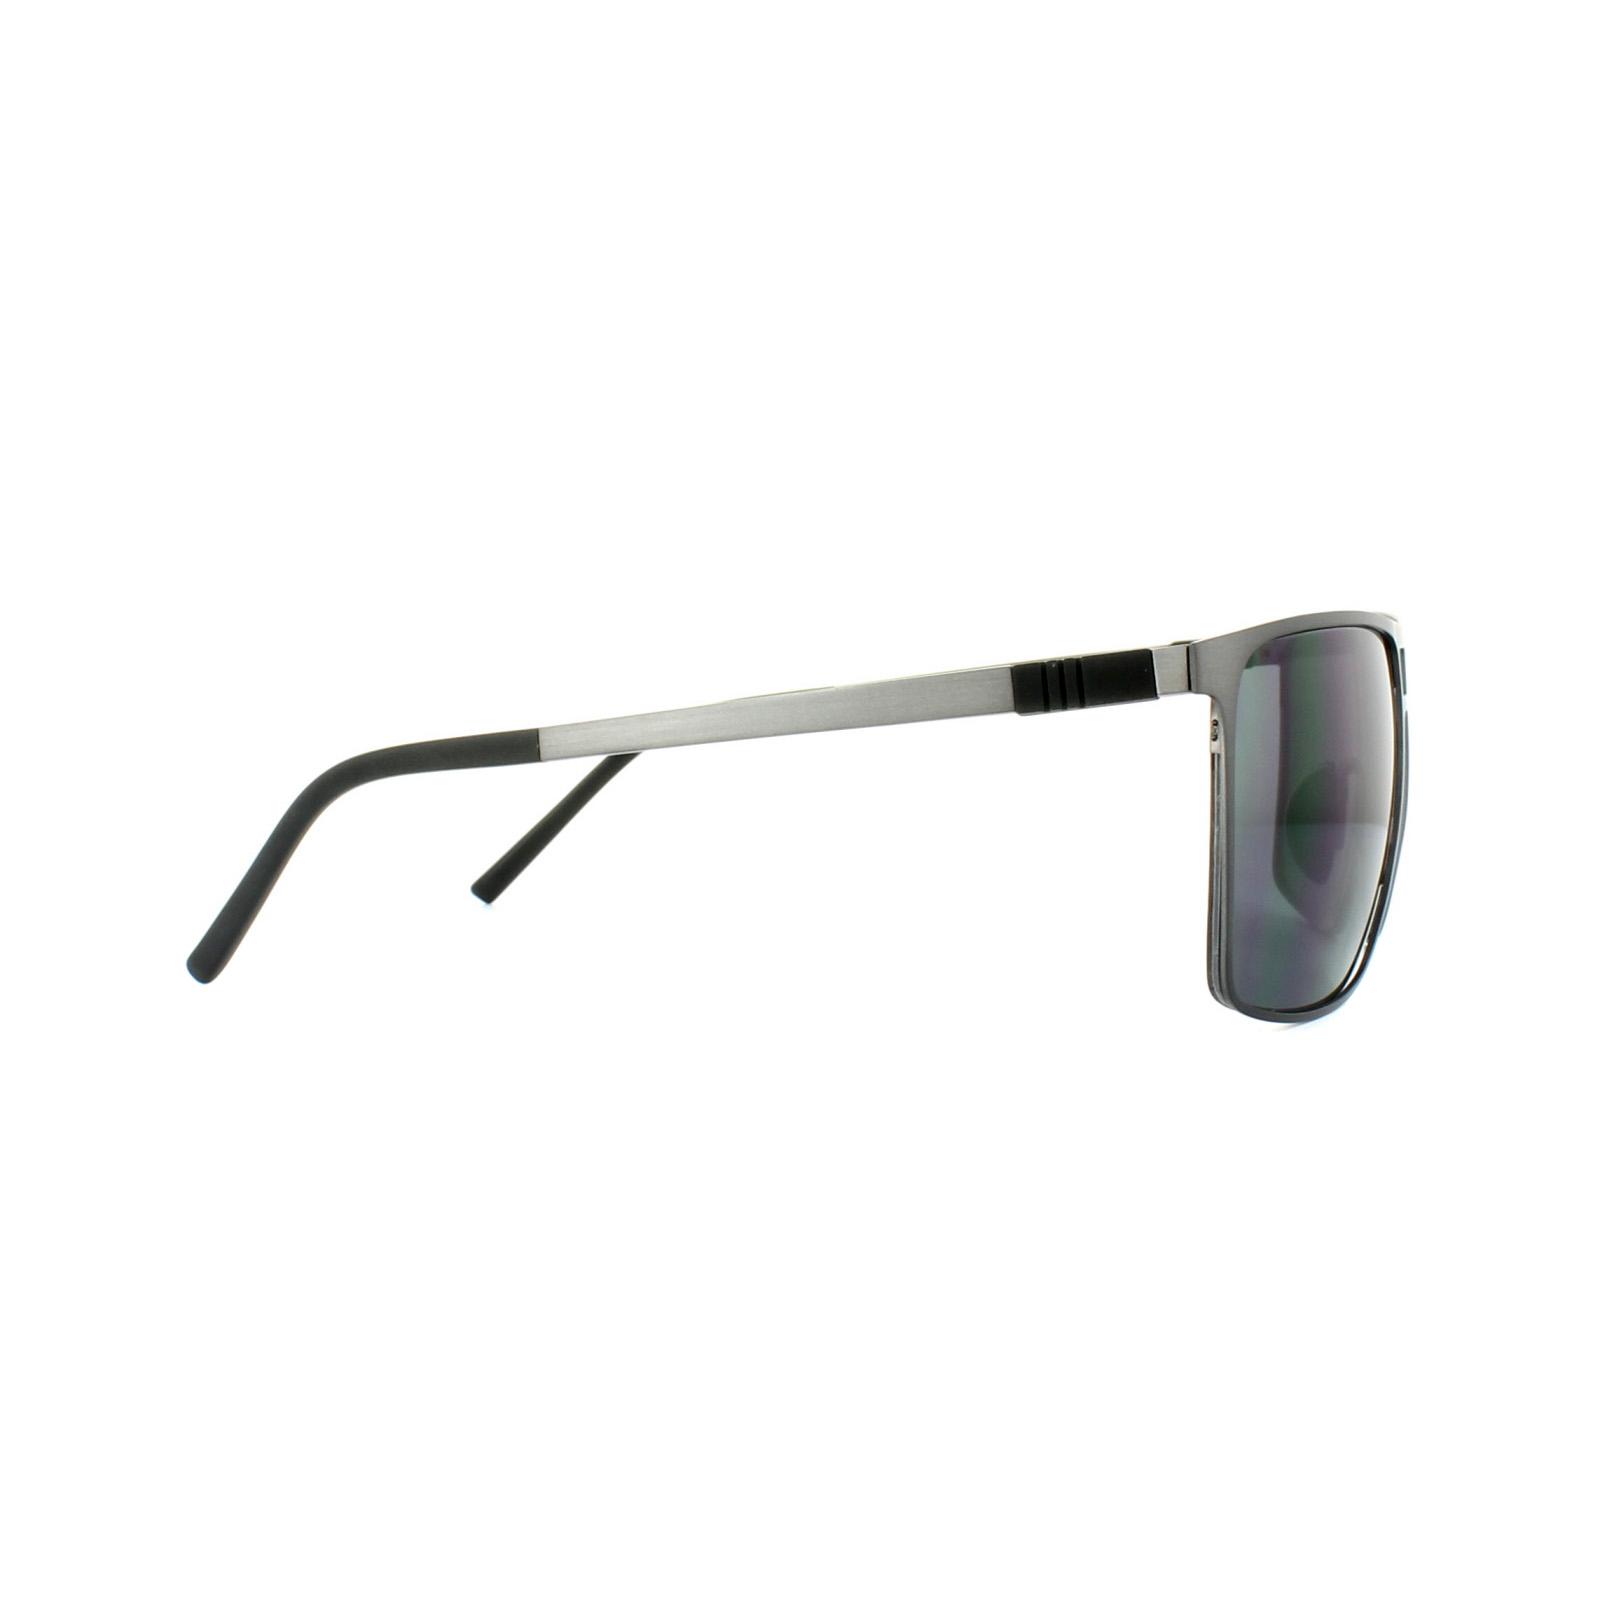 cf27738355 ... Porsche Design P8610 Sunglasses Thumbnail 4 ...